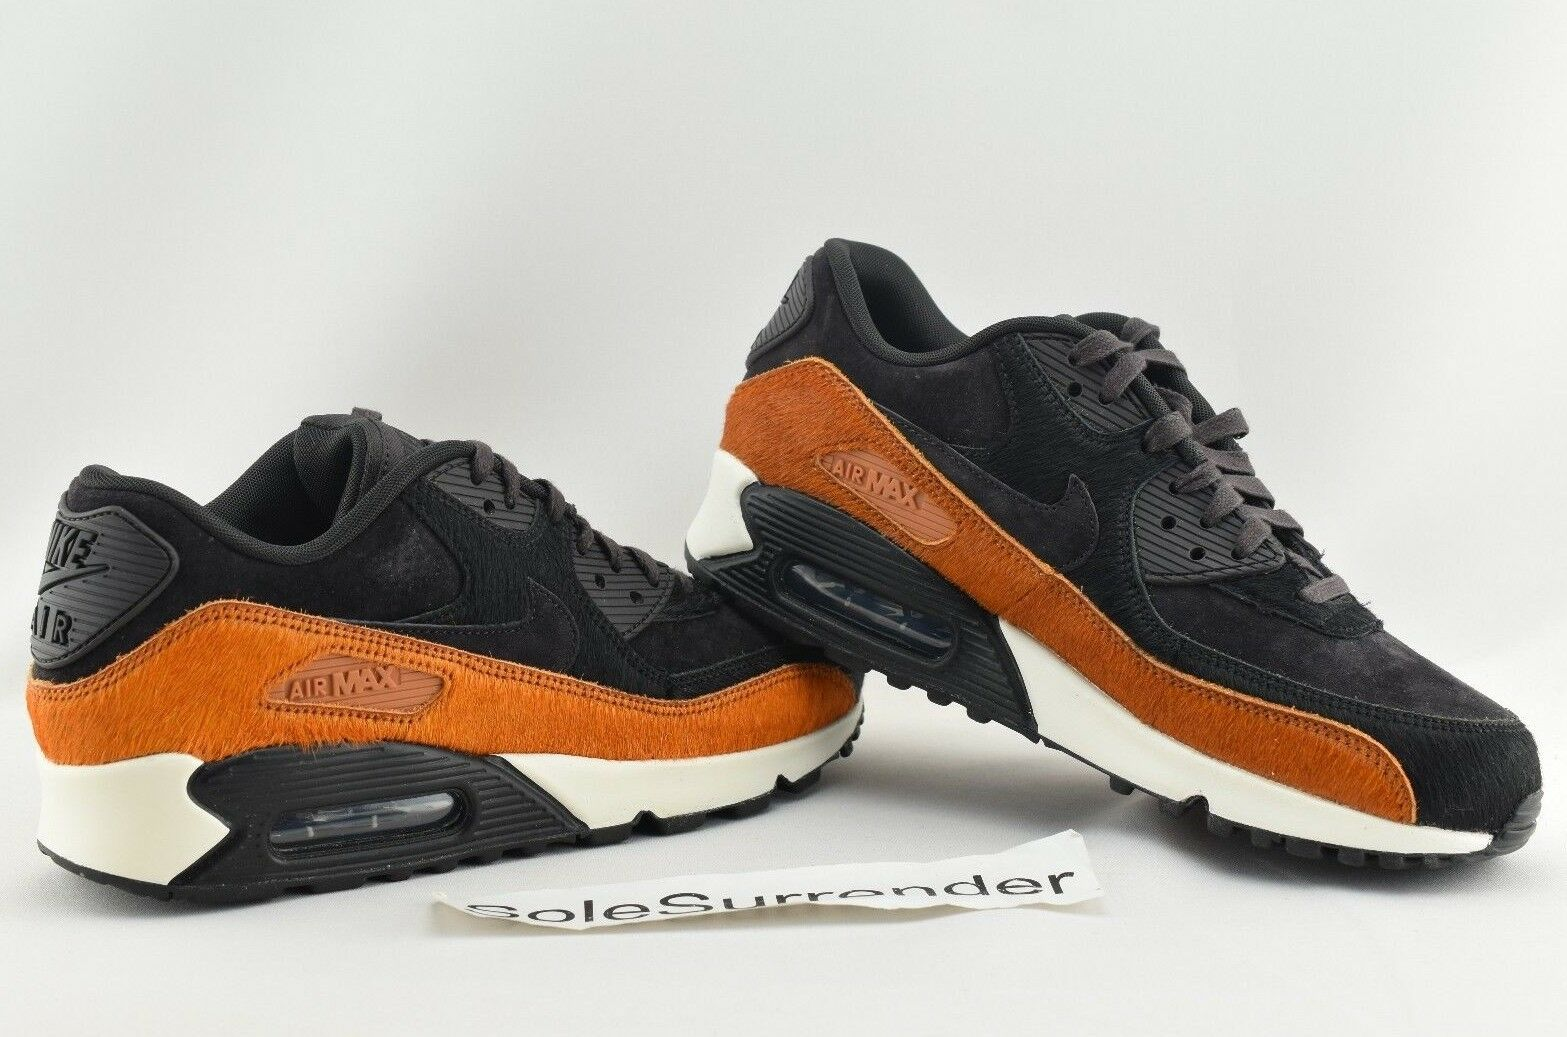 Women's Nike Air Max 90 LX - SIZE 8 - Tar Black Pony Horse Hair Brown